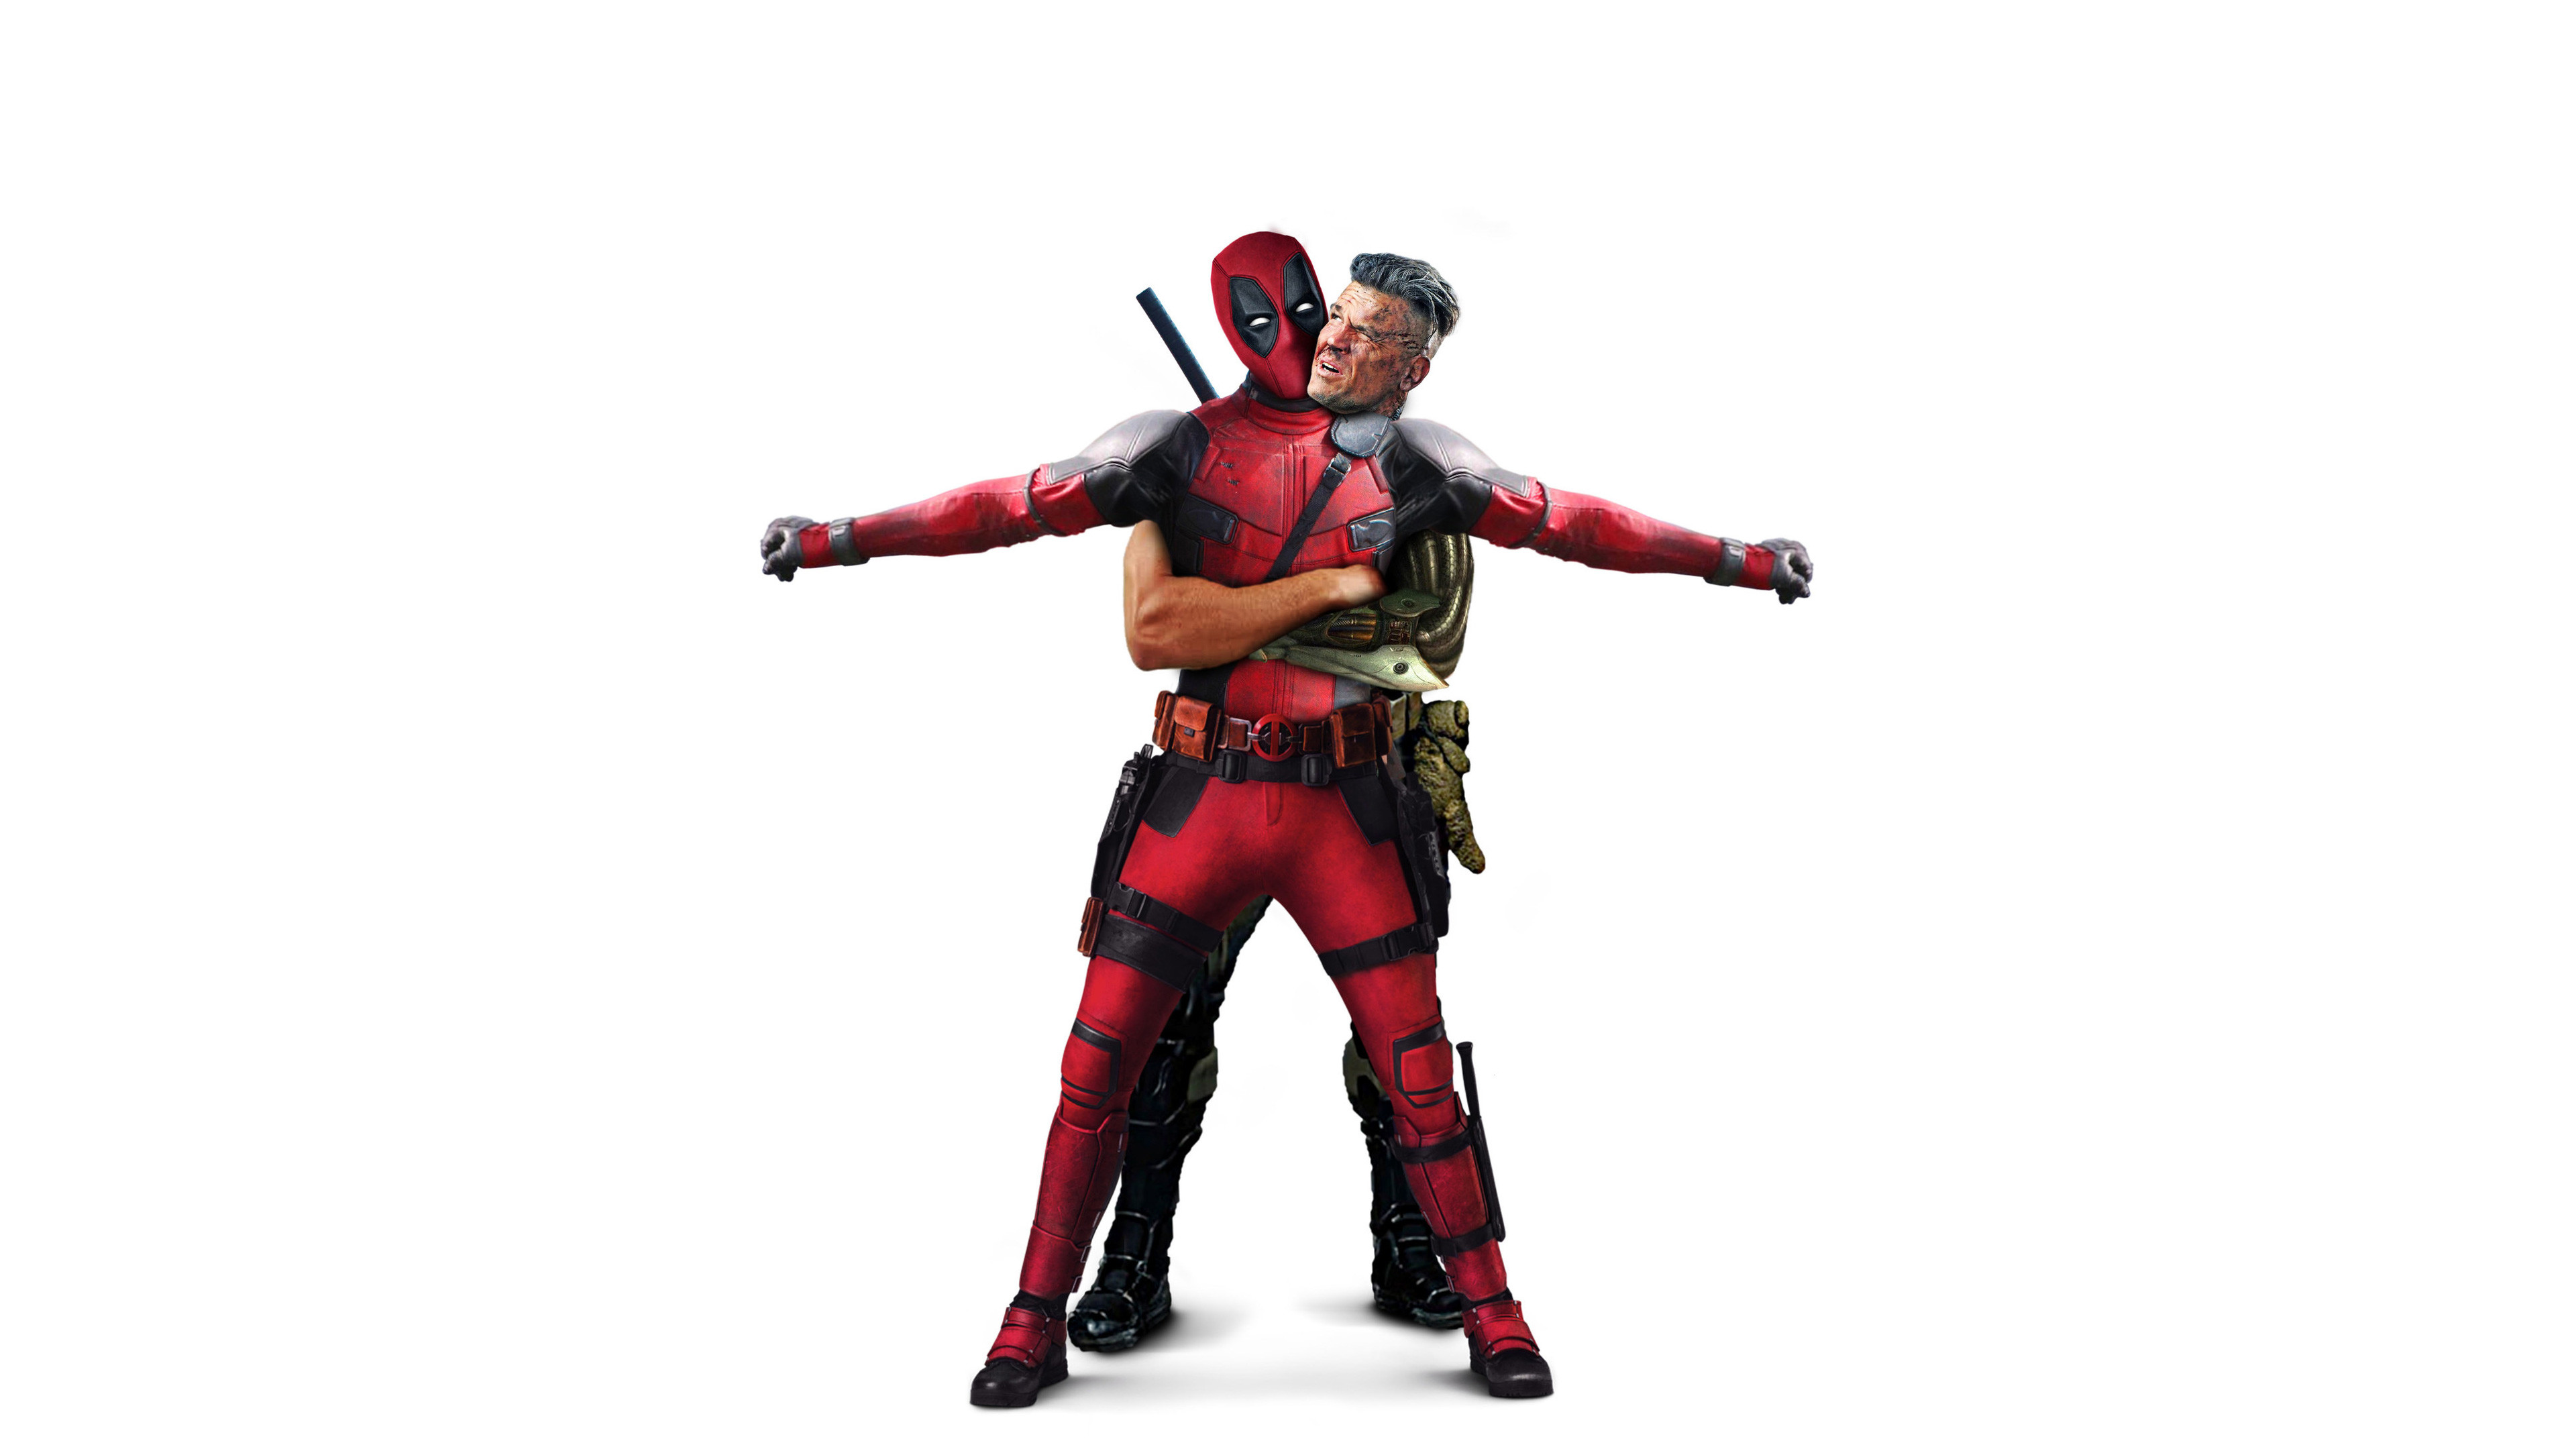 Res: 3840x2160, Deadpool 2 Movie 4k - Deadpool 2 Movie 4k - Wallpapers, 4k